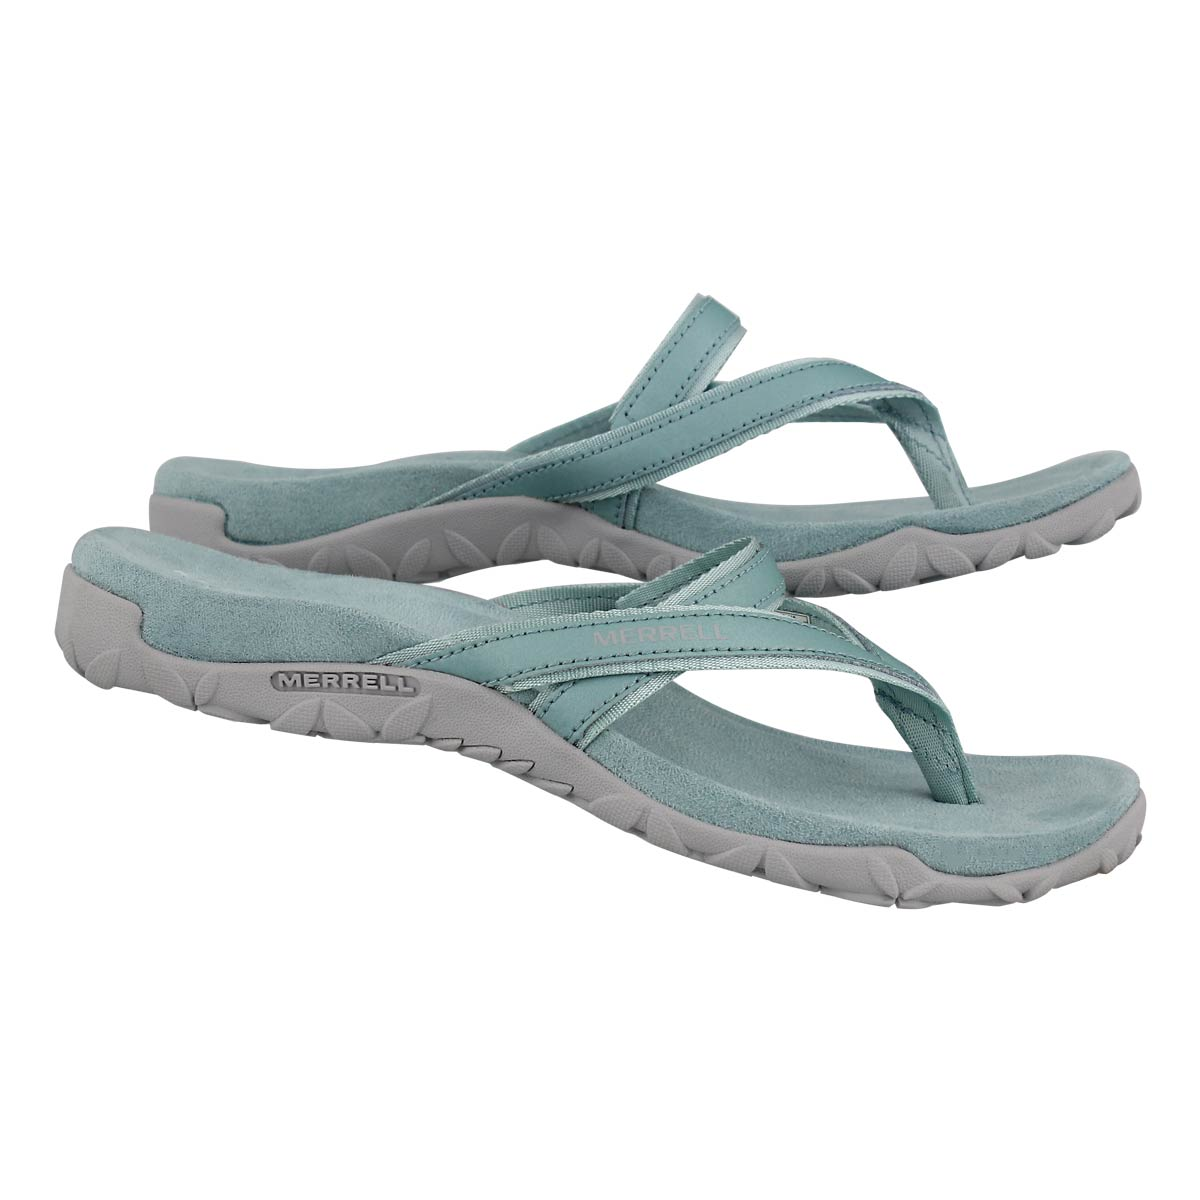 Lds Terran Ari Post aquifer thong sandal